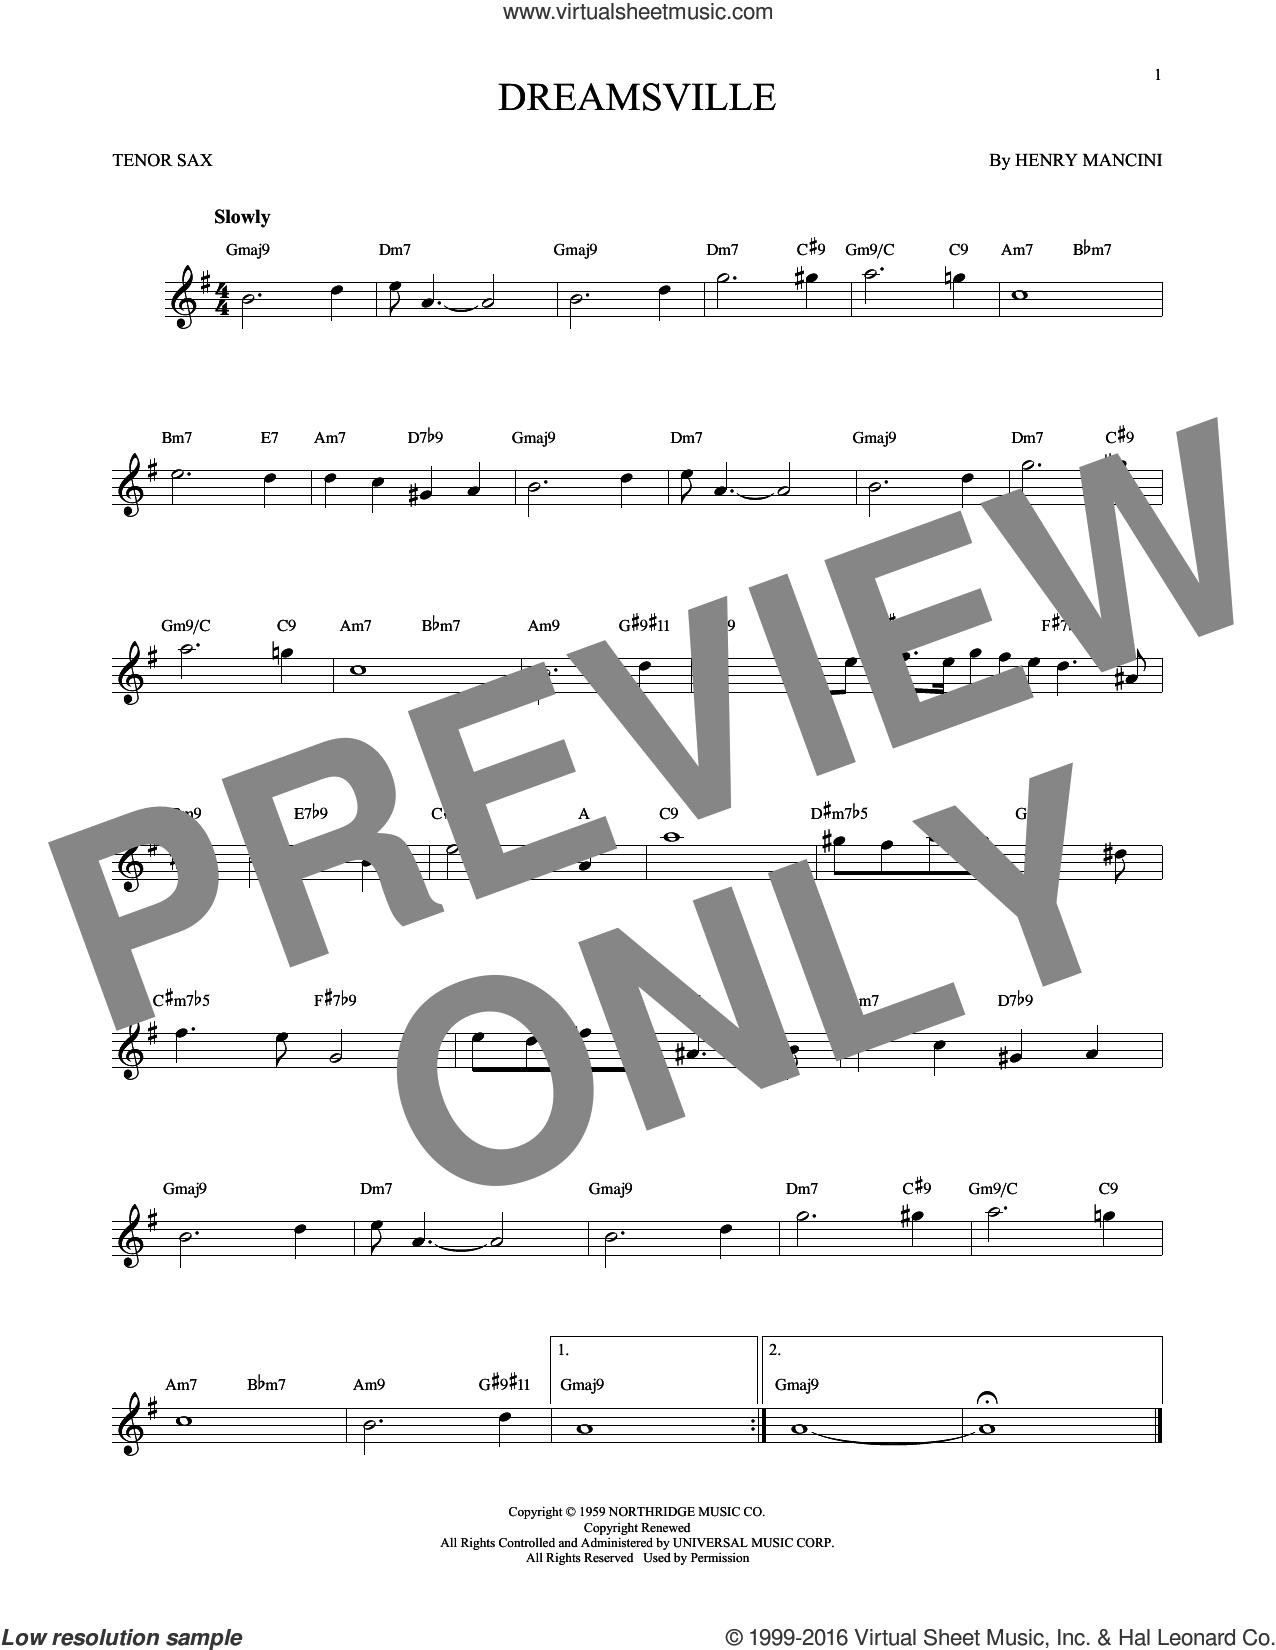 Dreamsville sheet music for tenor saxophone solo by Henry Mancini, intermediate skill level